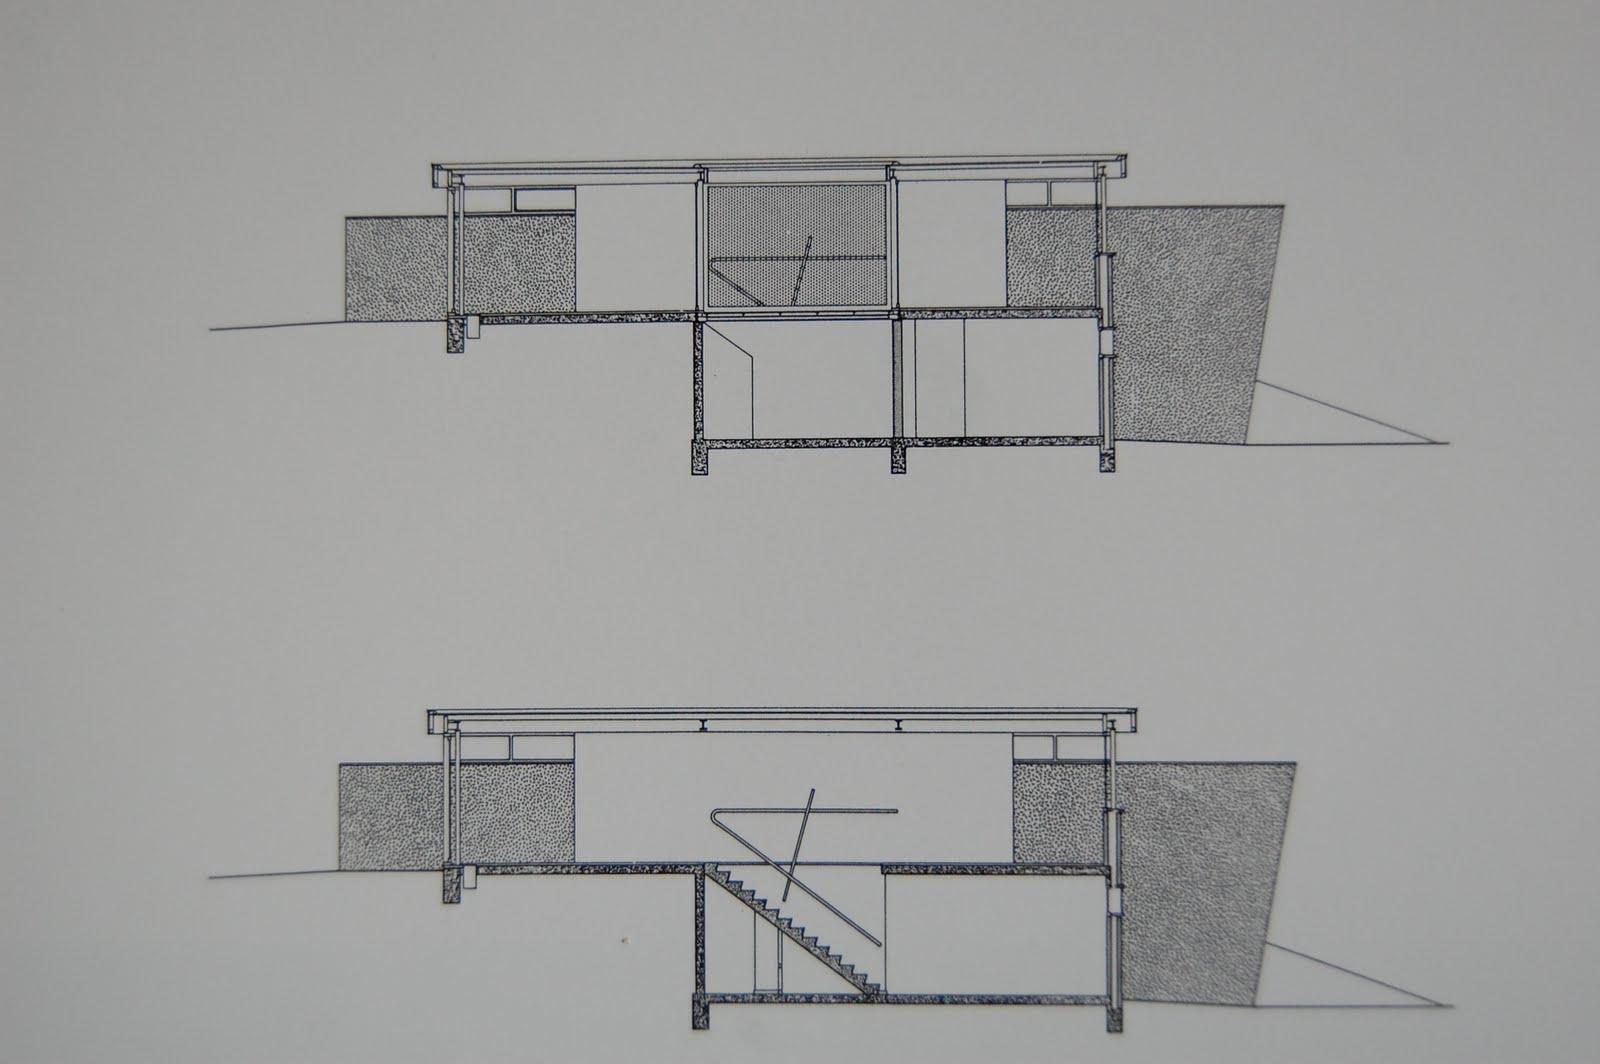 Arquitectura 1 agg dos casas patio arq rem koolhaas - Agg arquitectura ...